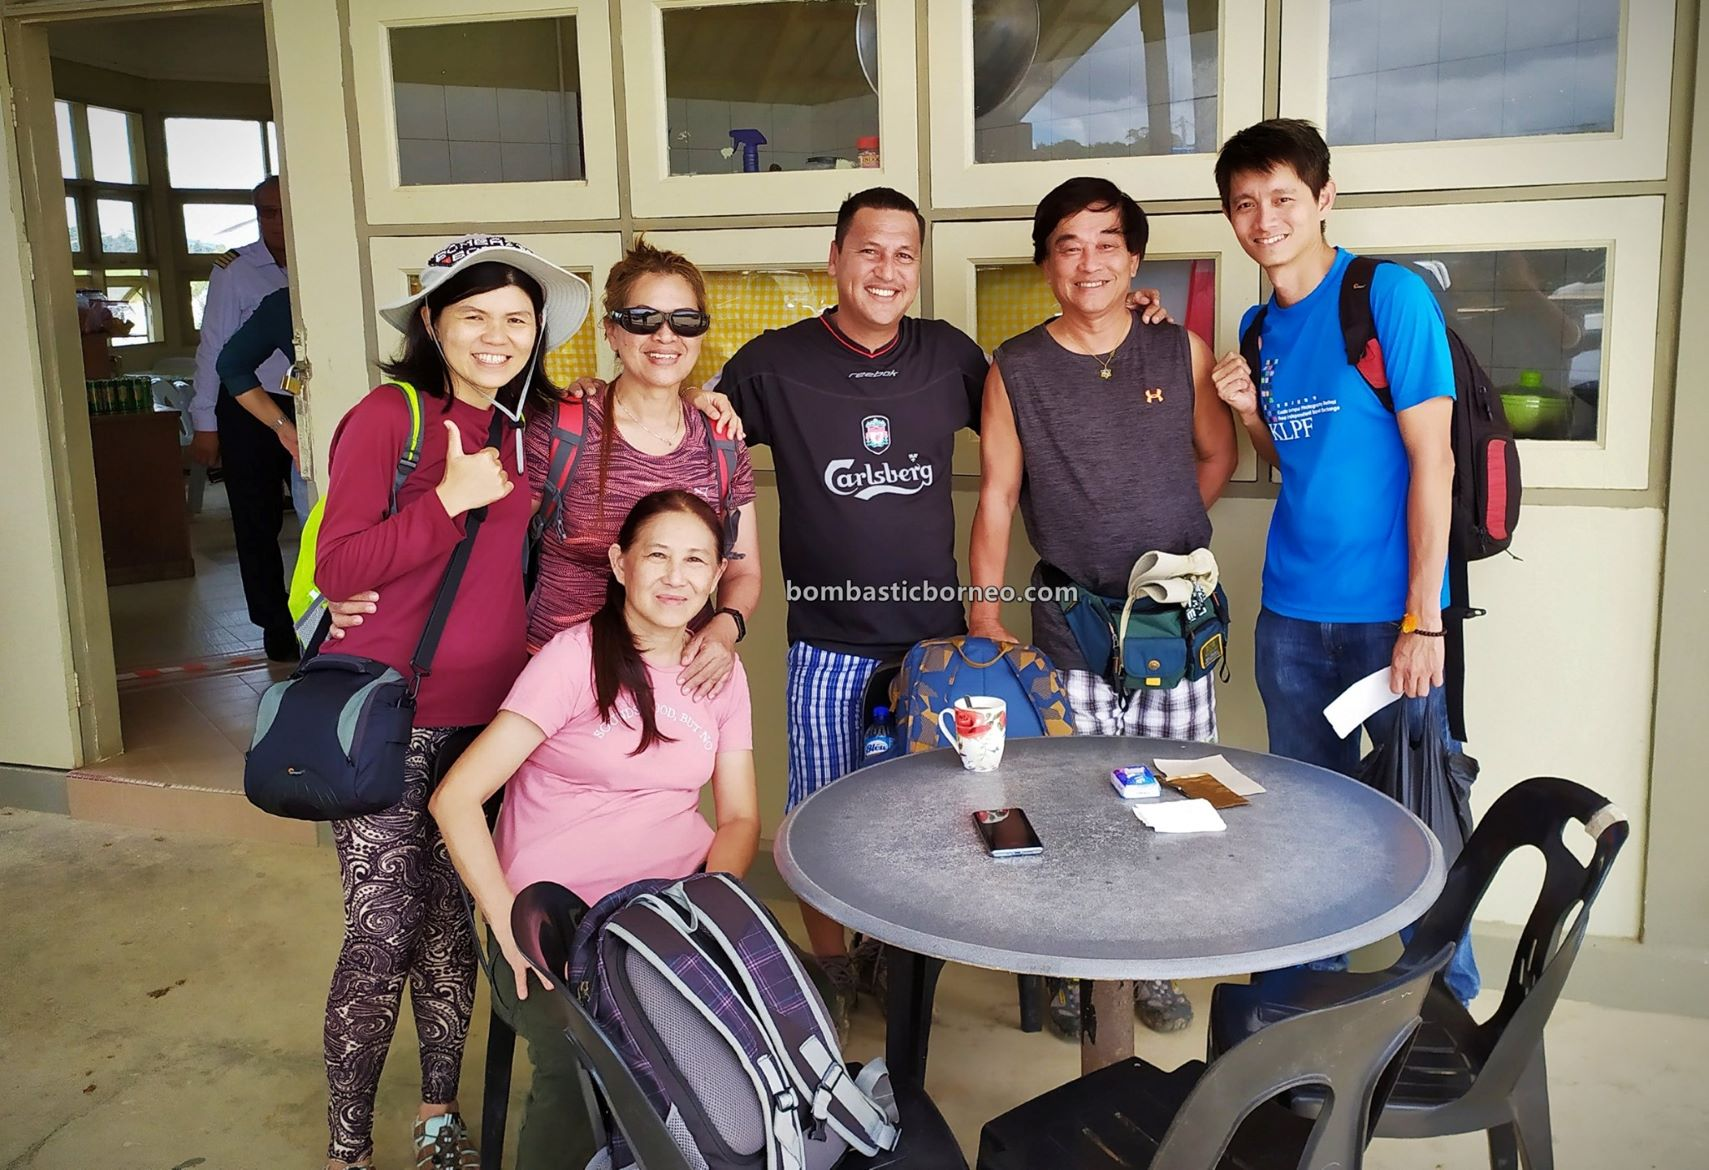 Pesta Nukenen, Kelabit village, backpackers, destination, exploration, Interior village, Ethnic, native, Orang Ulu, tribe, Trans Border, Borneo, 穿越婆罗洲马来西亚, 砂拉越巴里奥高原,